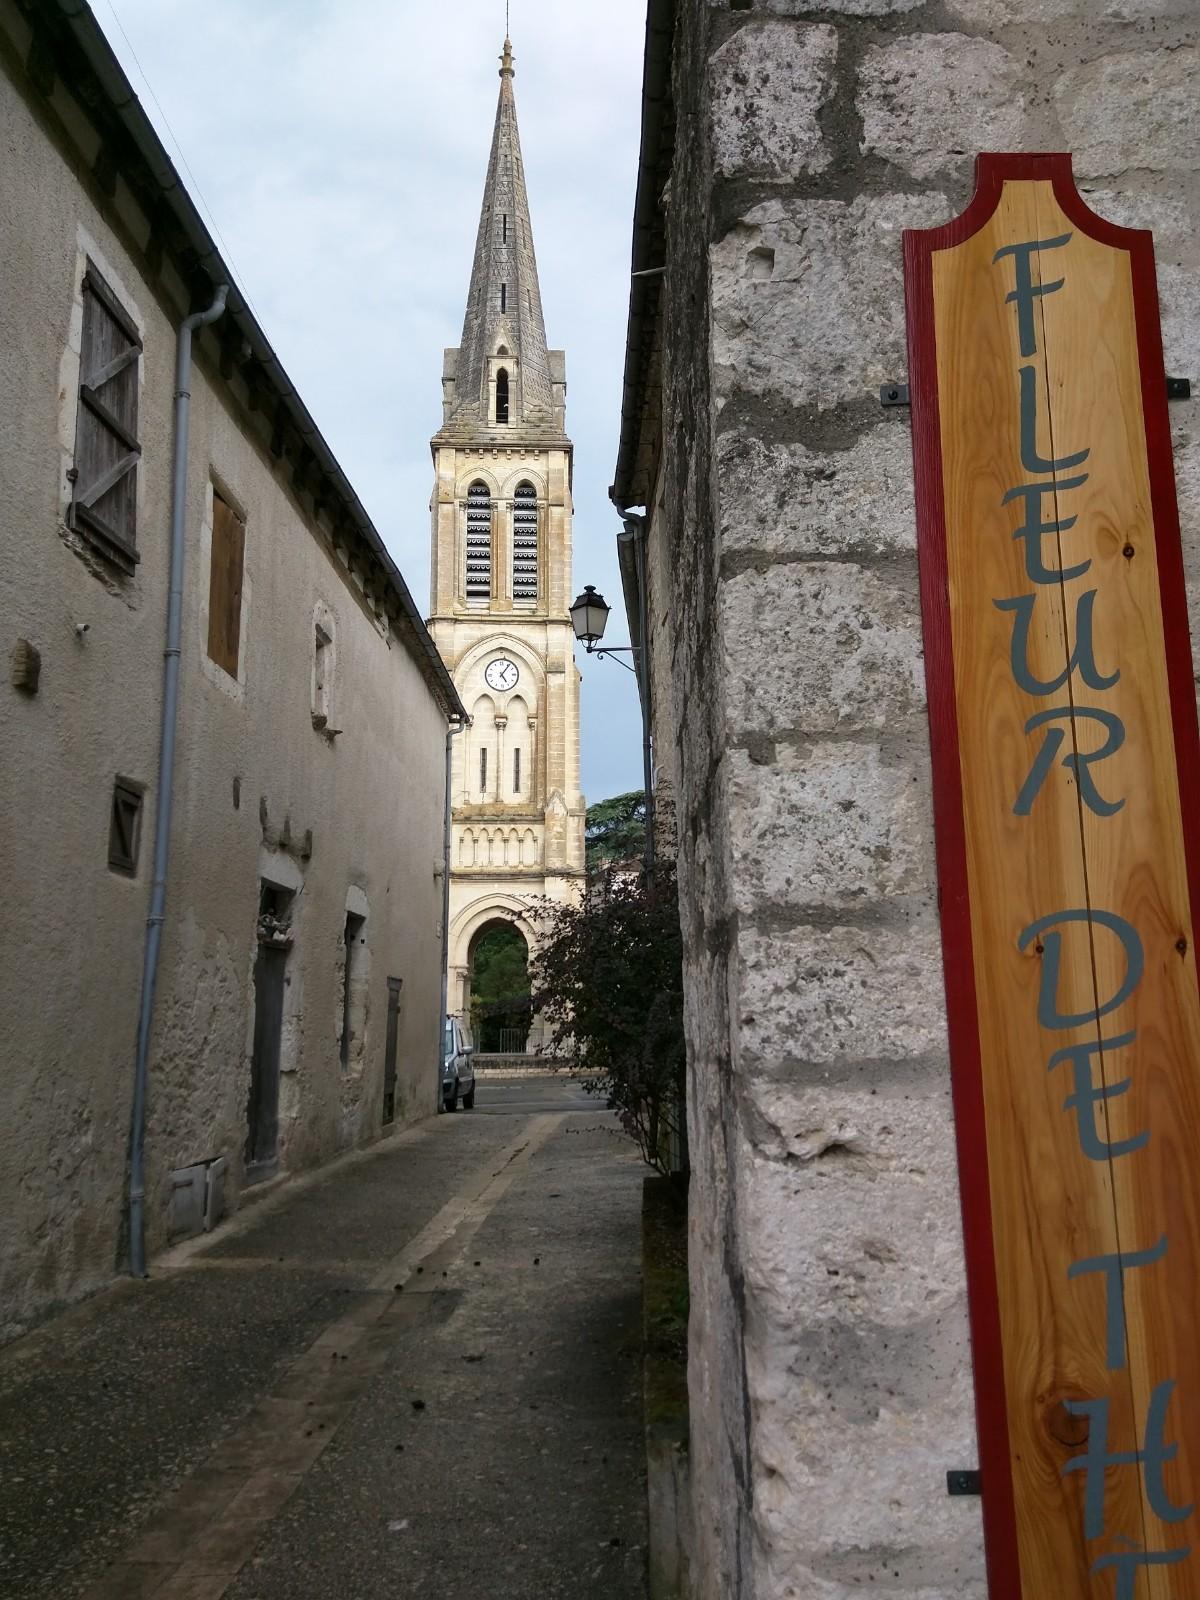 Eymet, Dordogne, Nouvelle-Aquitaine, France